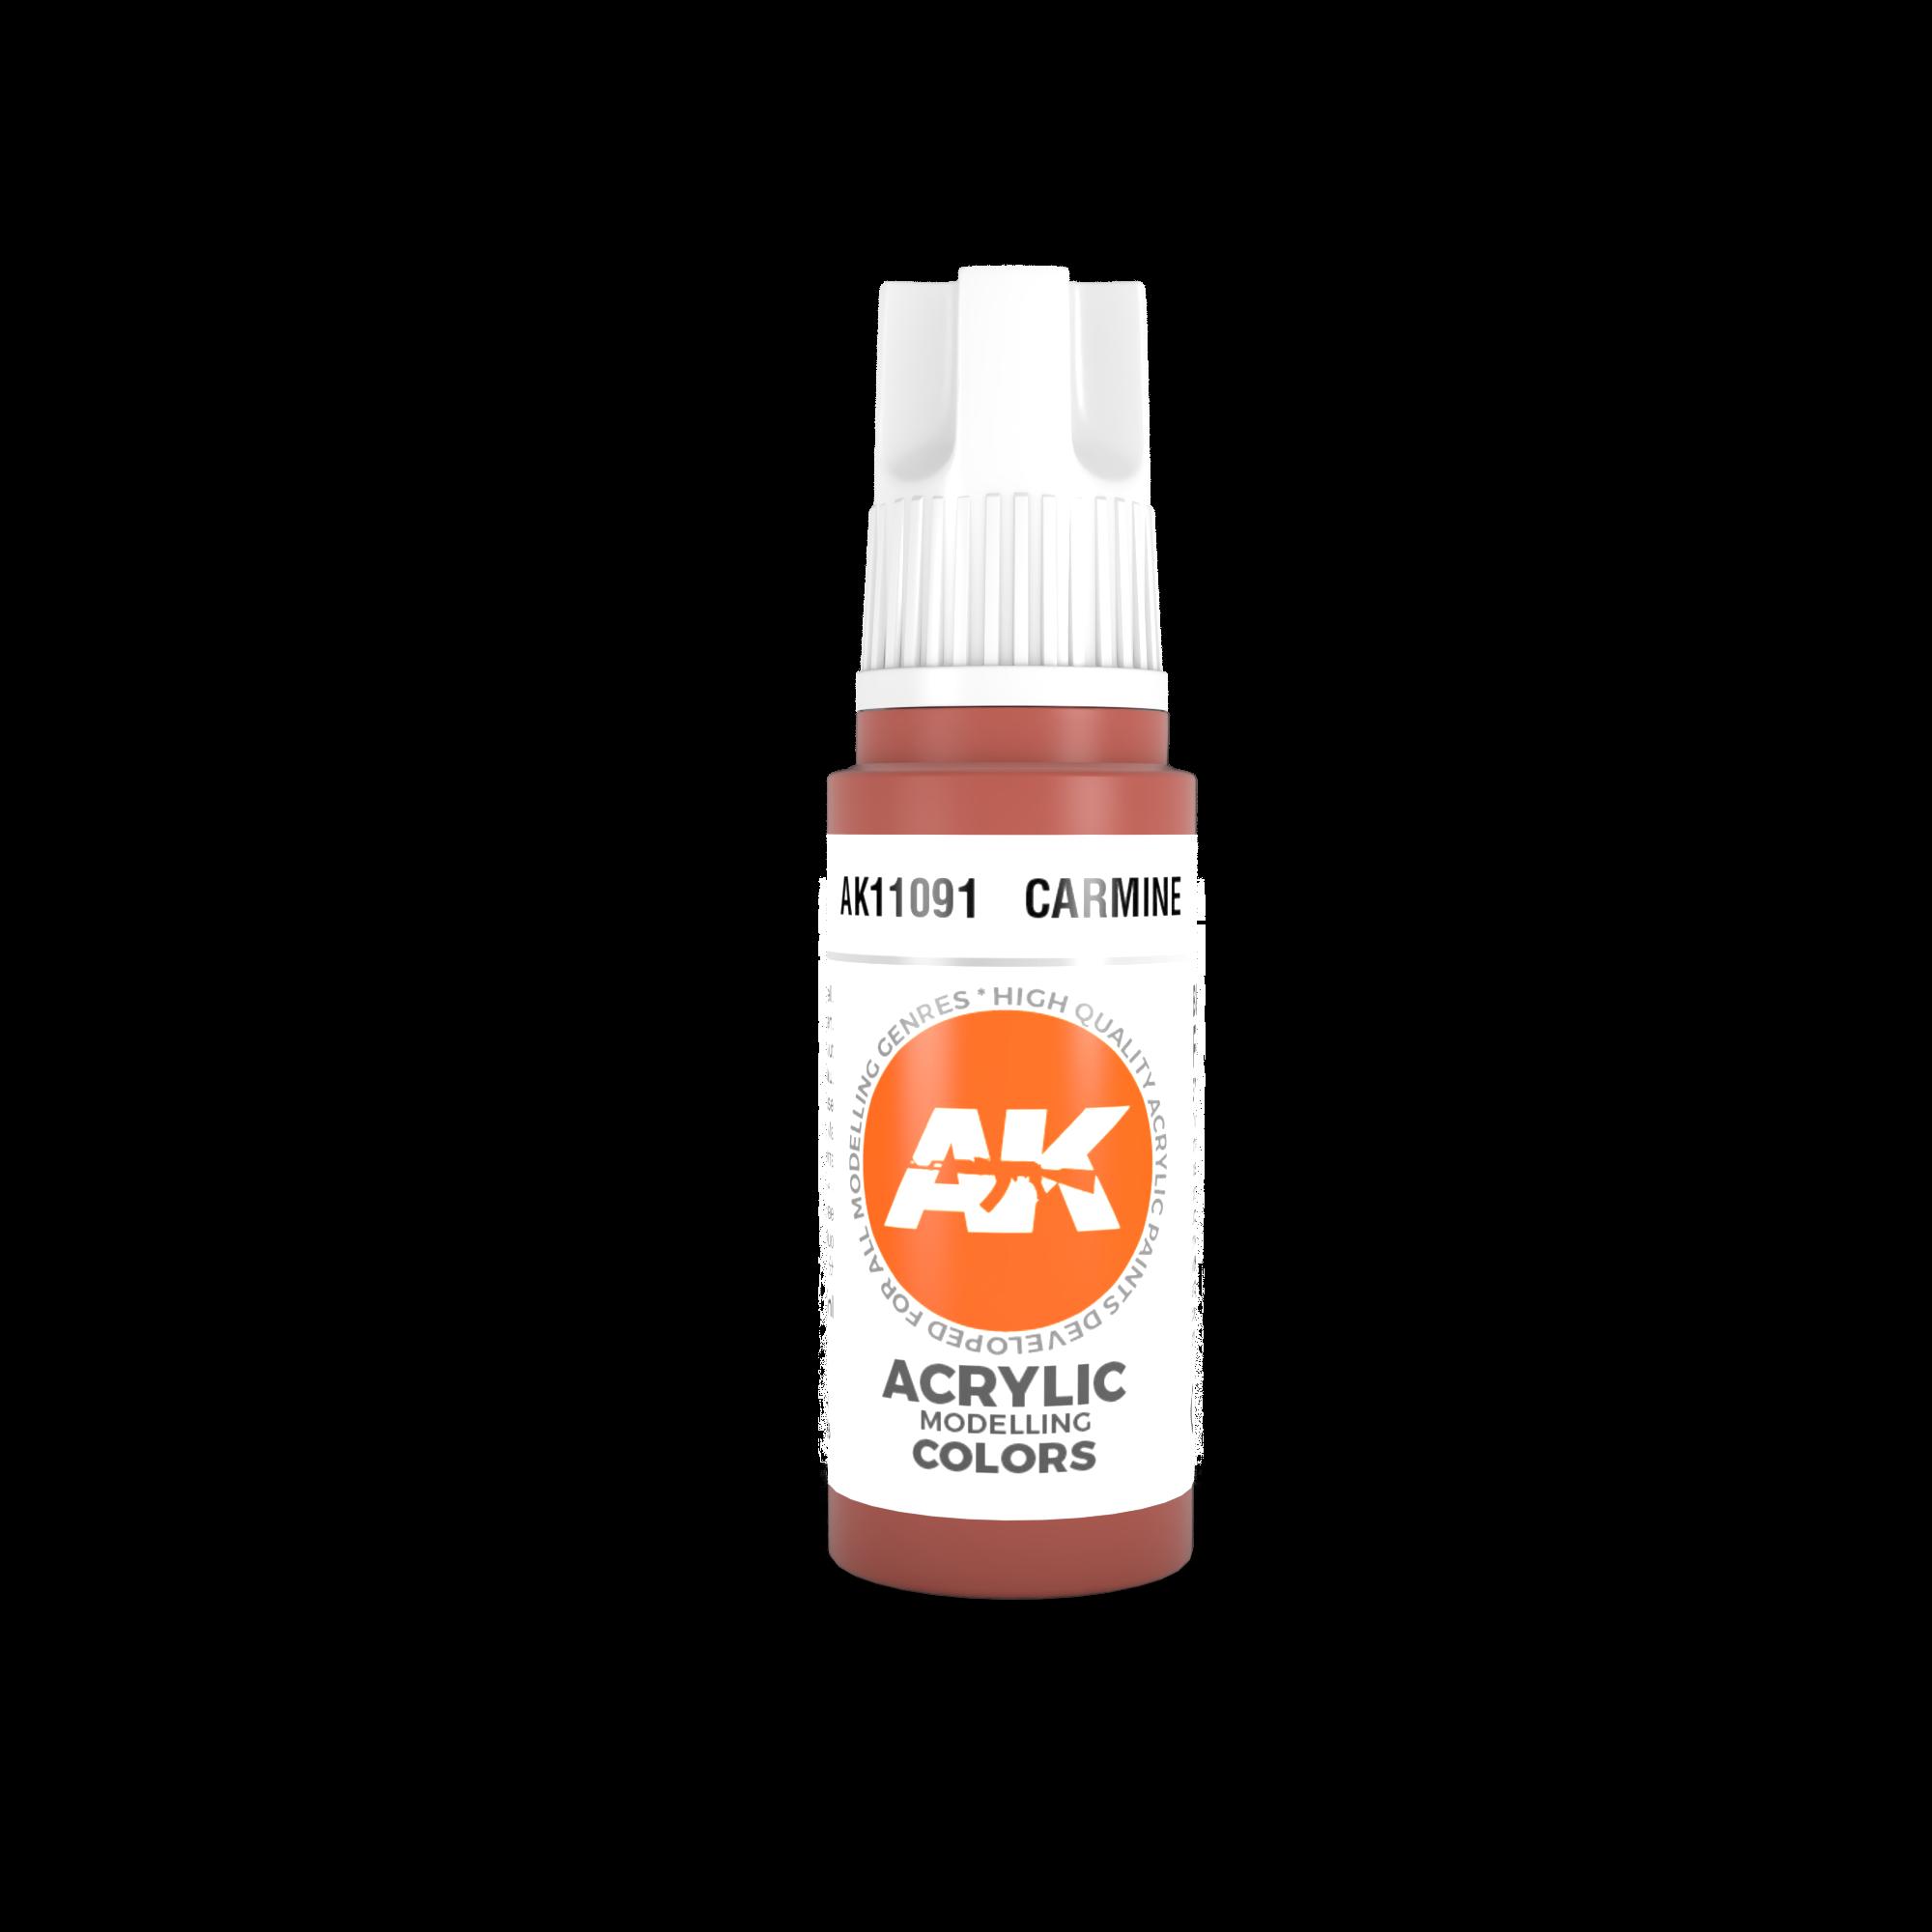 AK-Interactive Carmine Acrylic Modelling Color - 17ml - AK-11091